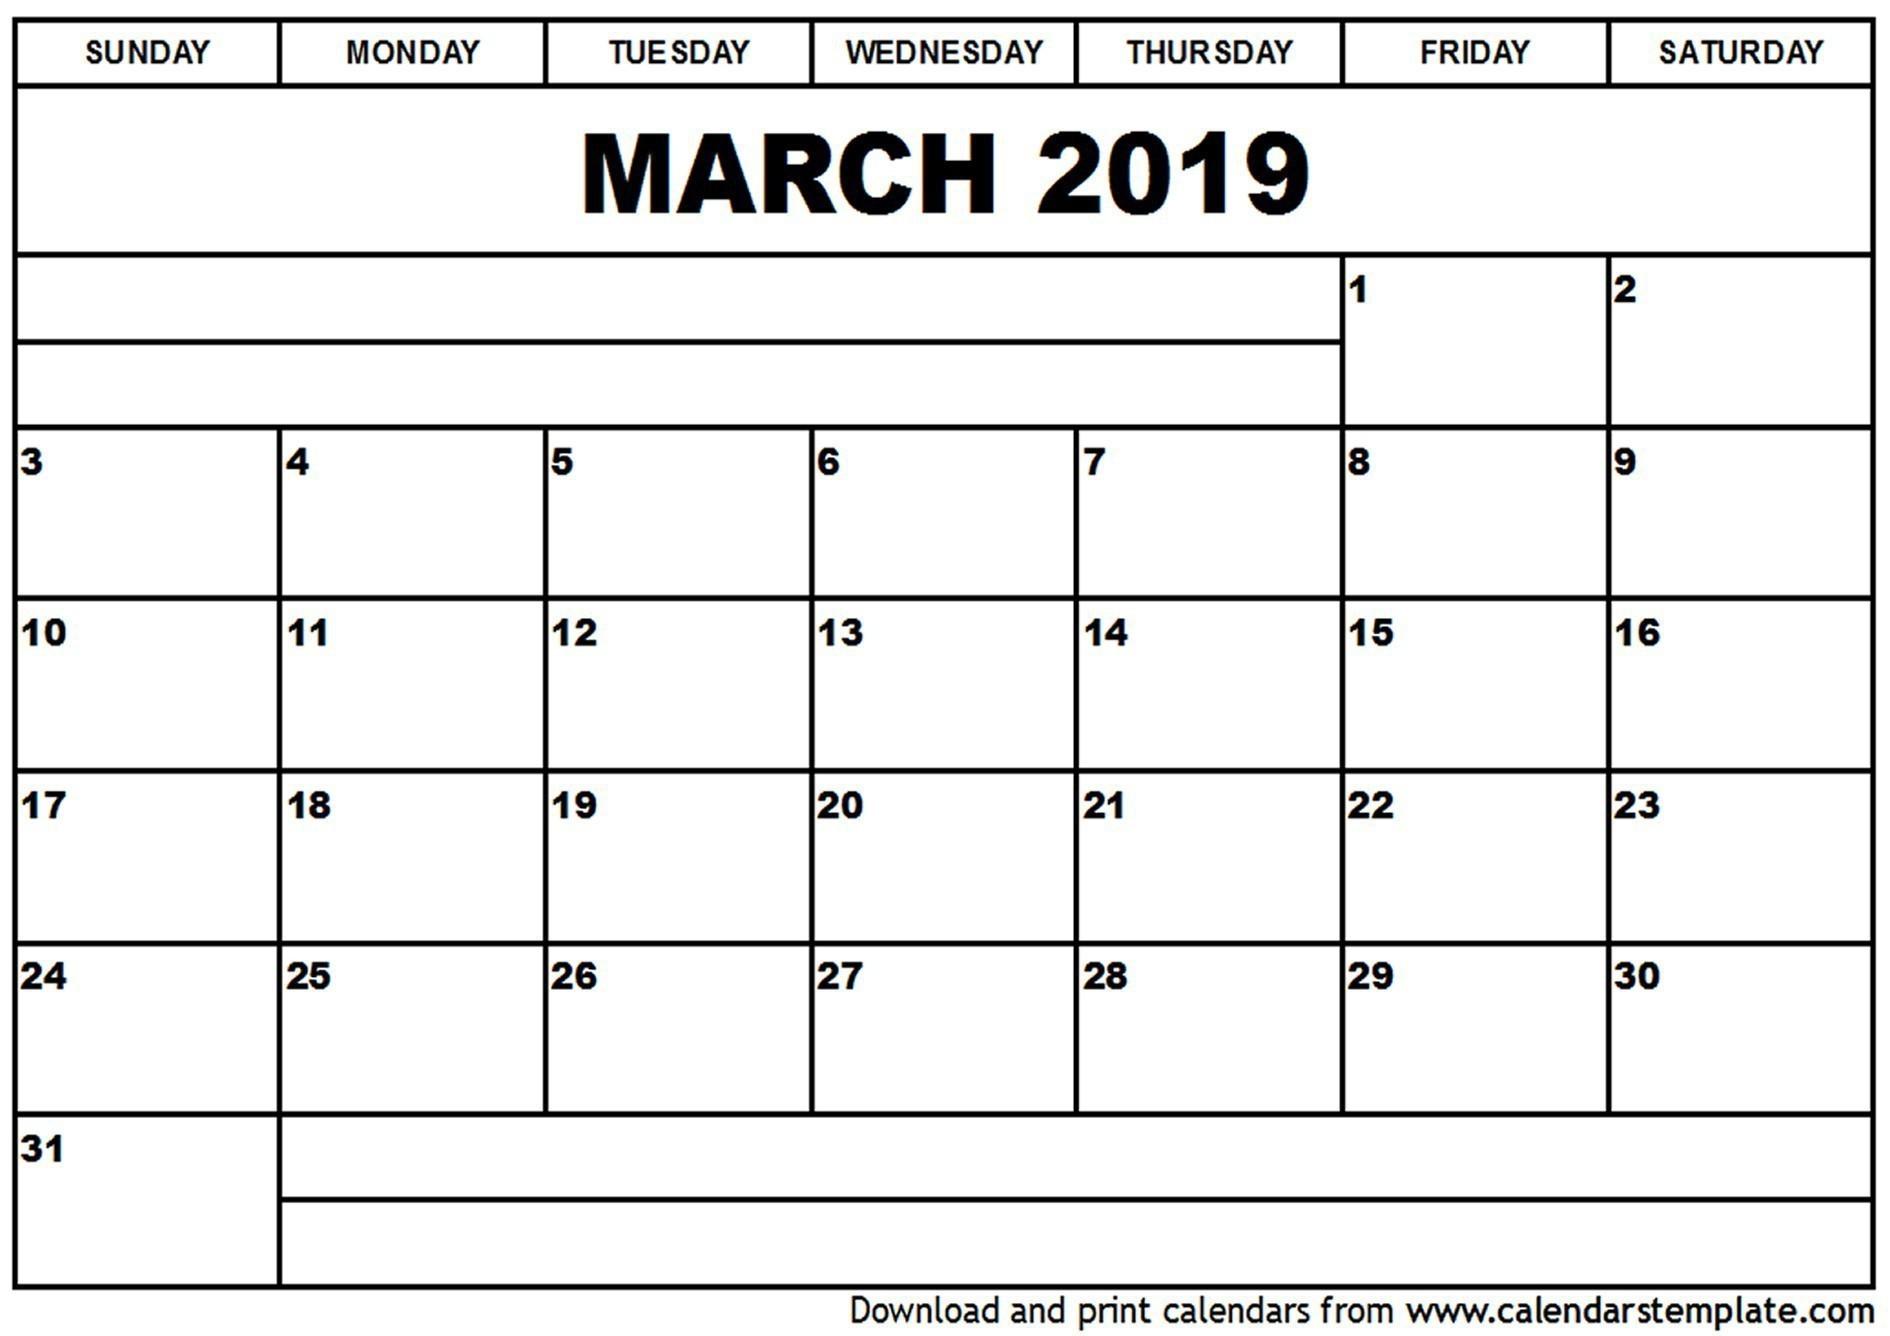 Gujarati Calendar 2019 Printable Printed for No Cost – Calendaro